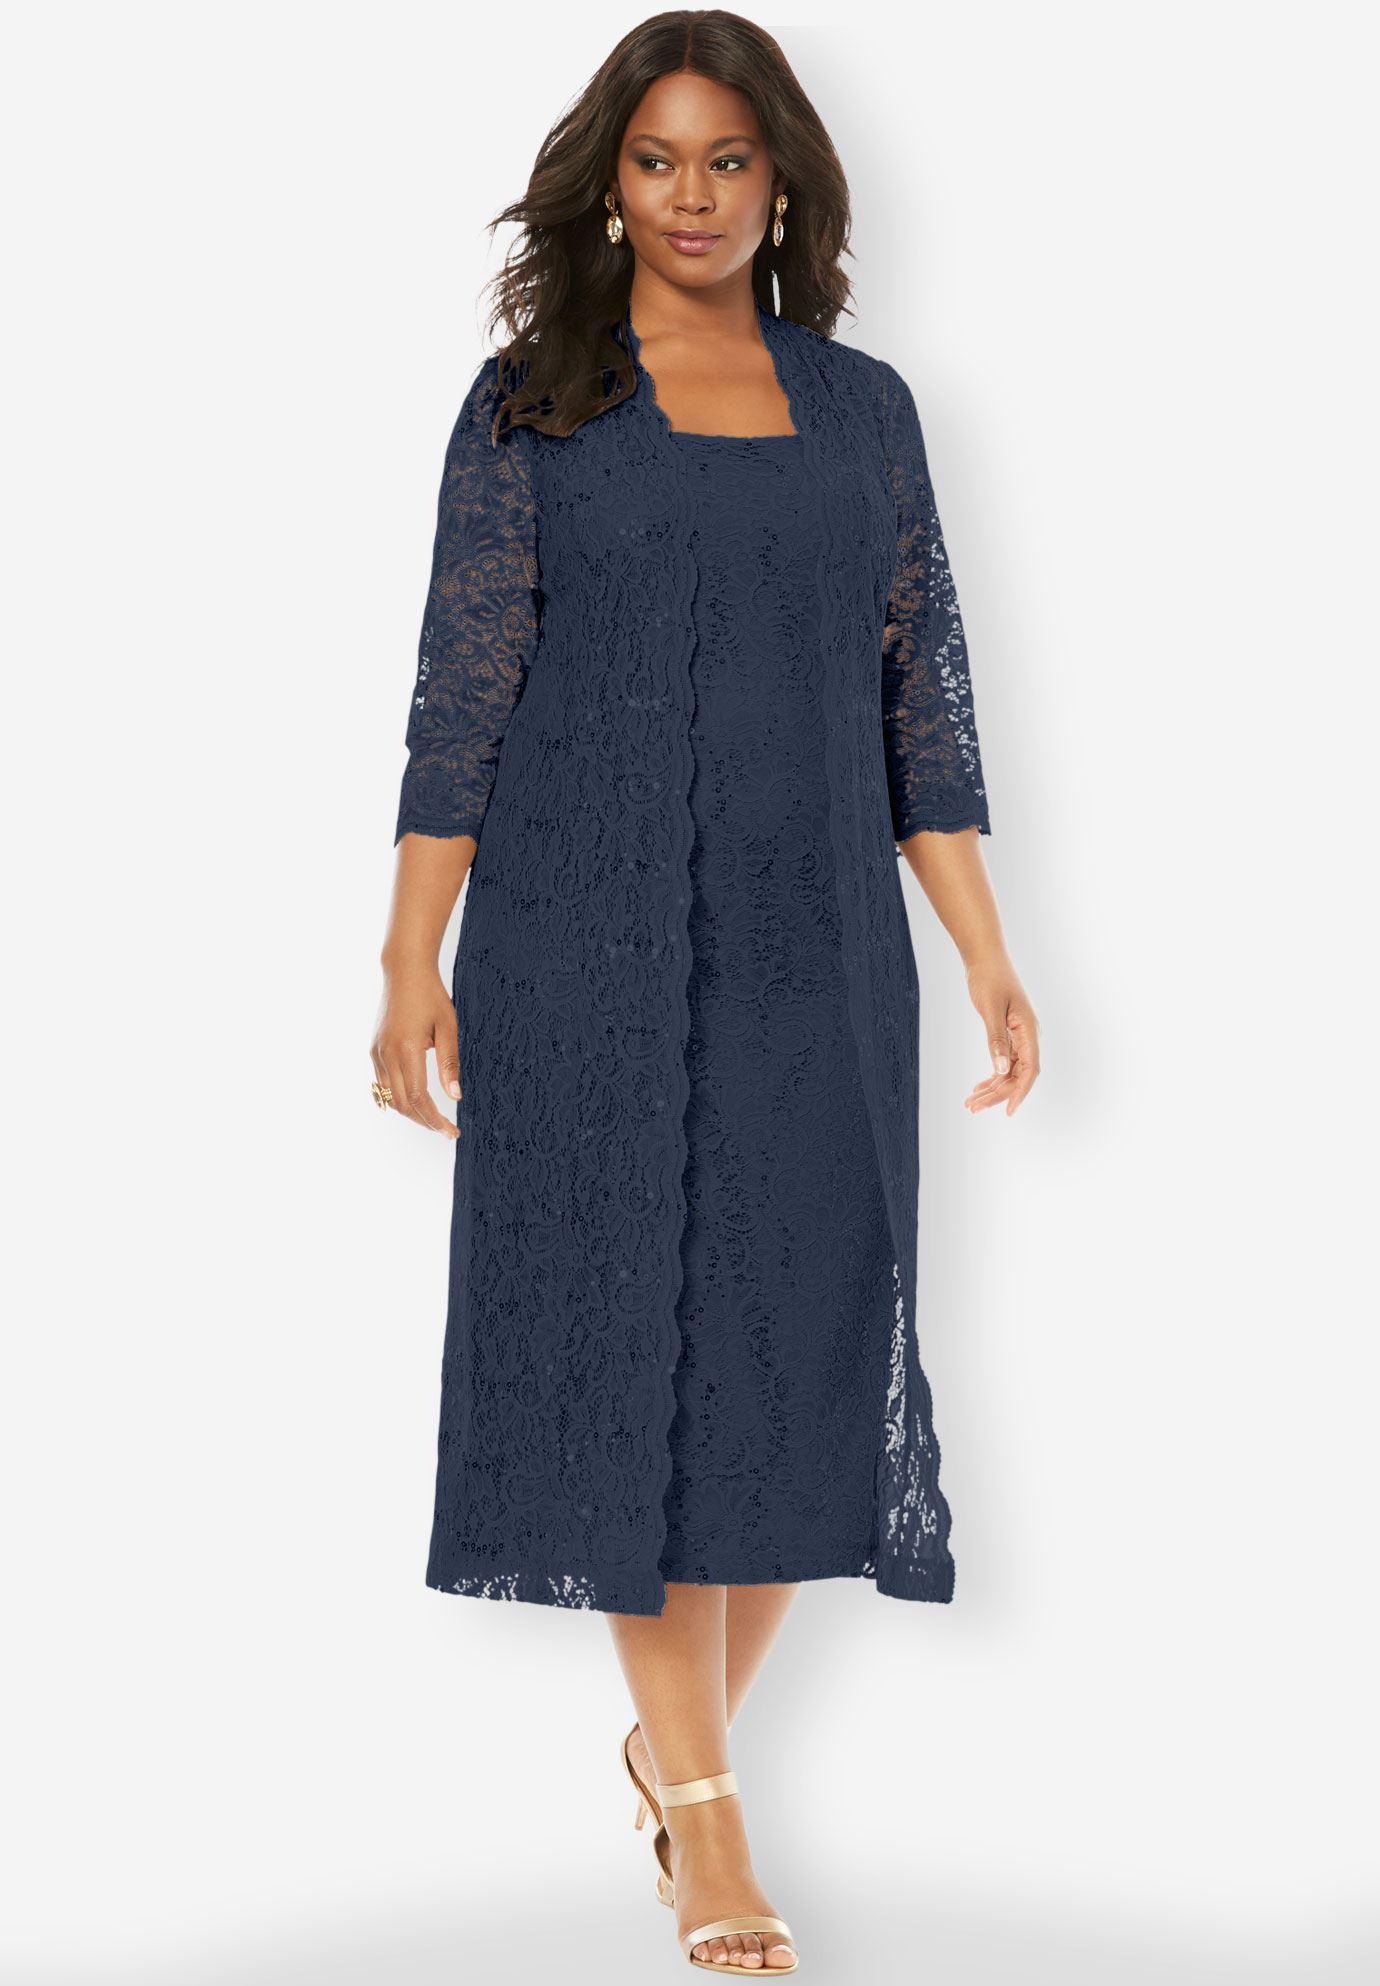 Flyaway Full Length Jacket Dress  Plus Size Special